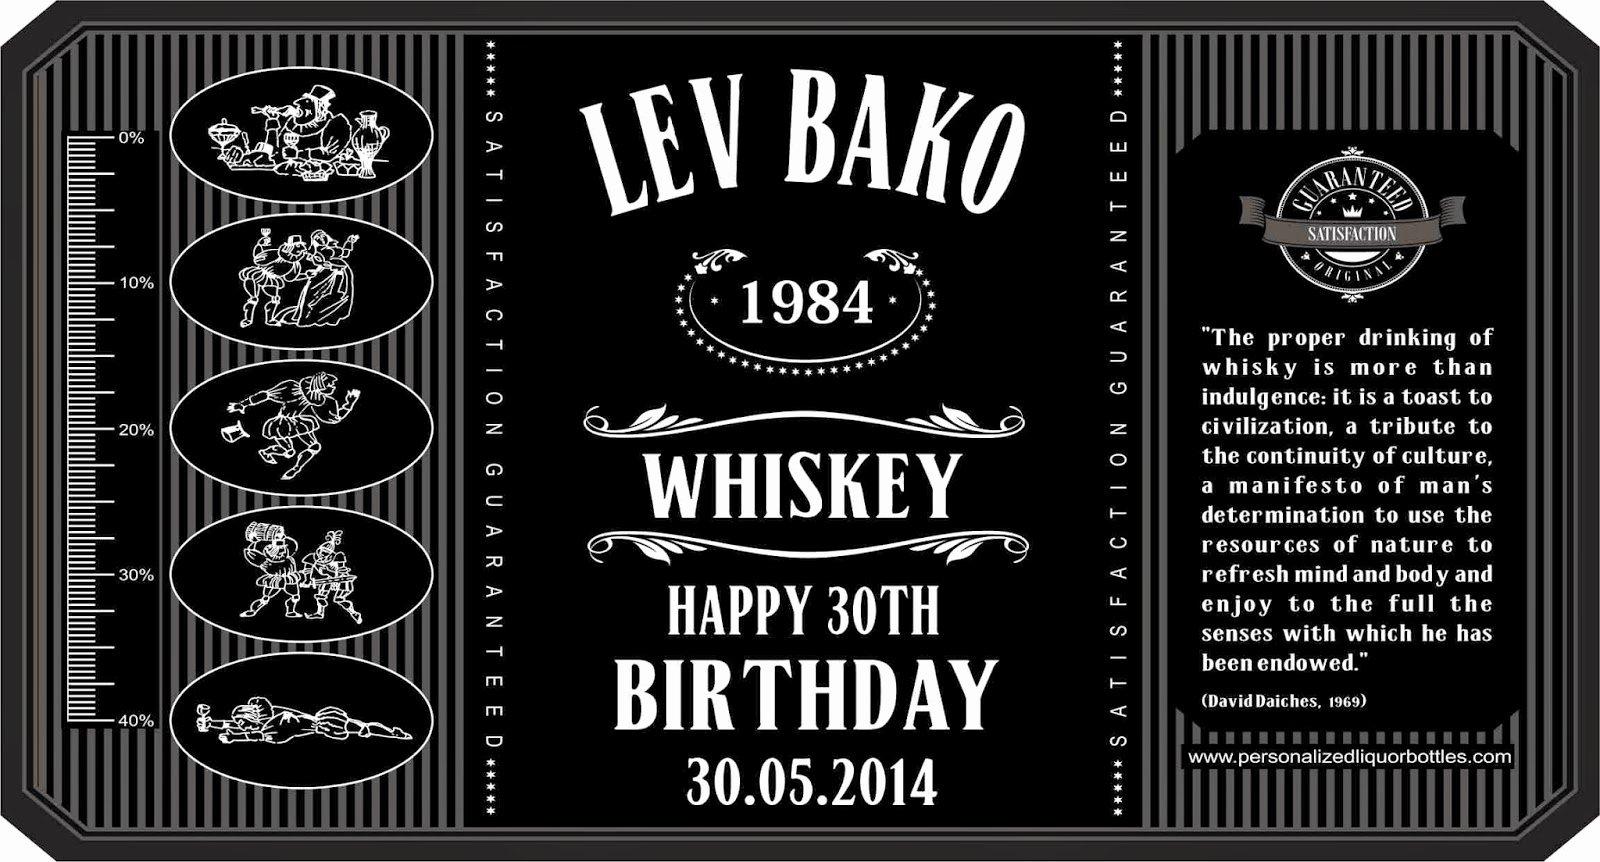 Free Jack Daniels Label Template Best Of Personalized Liquor Bottles Personalized Whiskey Bottles